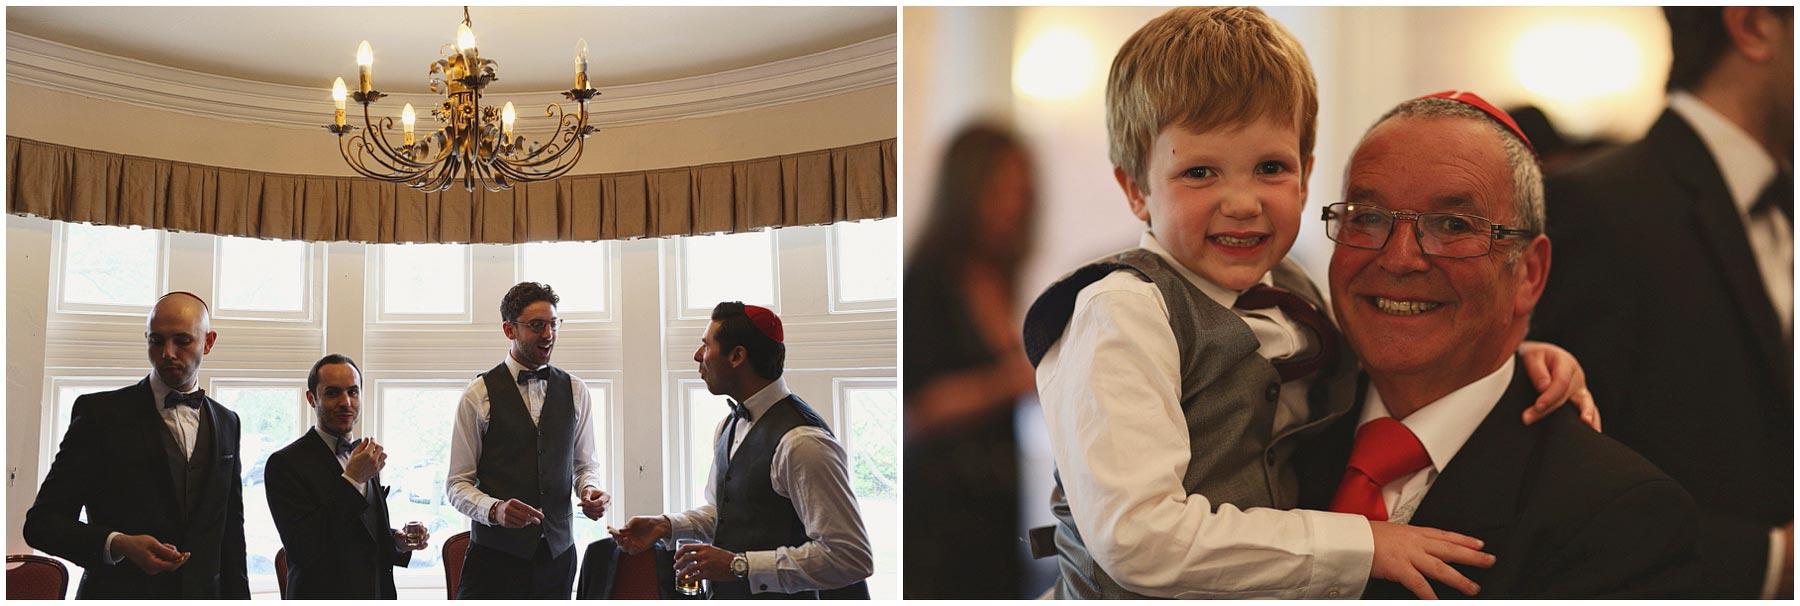 Jewish-Wedding-Photography_0040